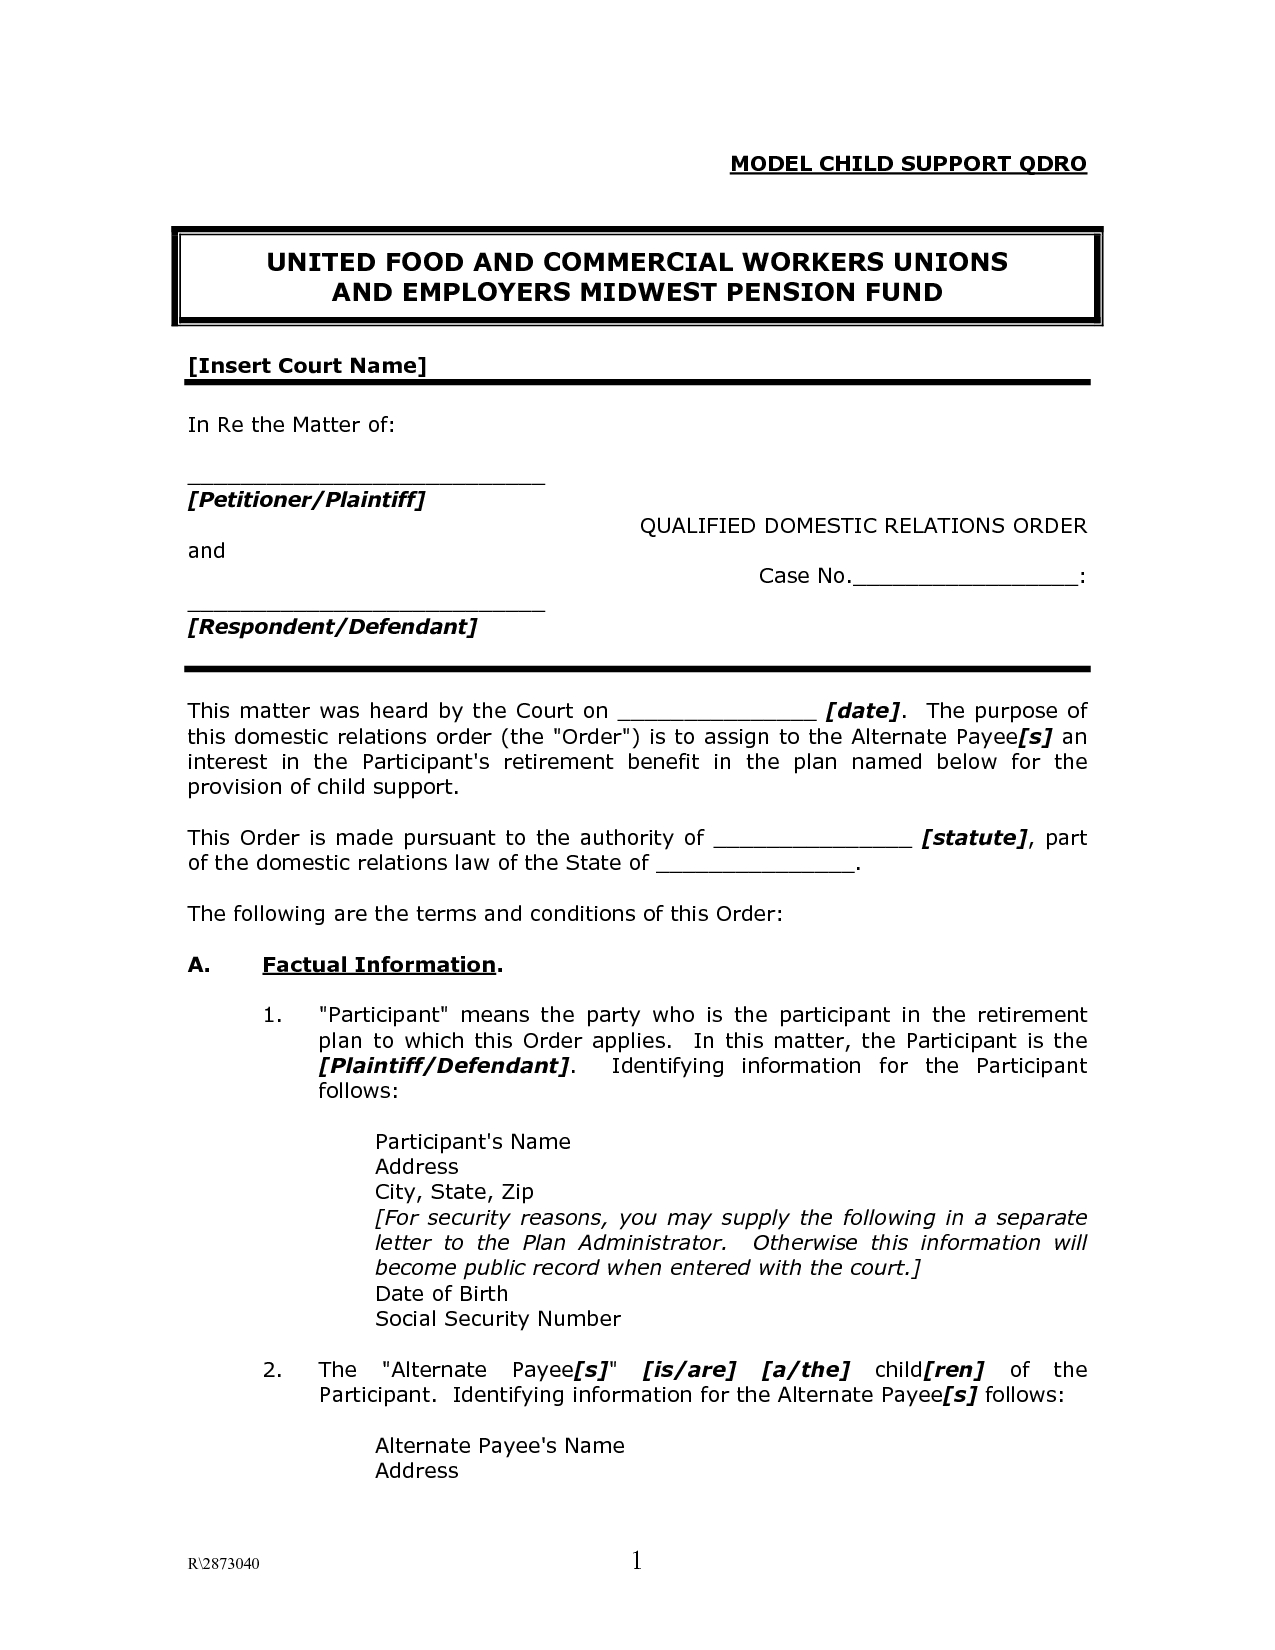 Illinois Divorce Paper Sample | Divorce Records | Divorce Forms - Free Printable Divorce Papers For Illinois